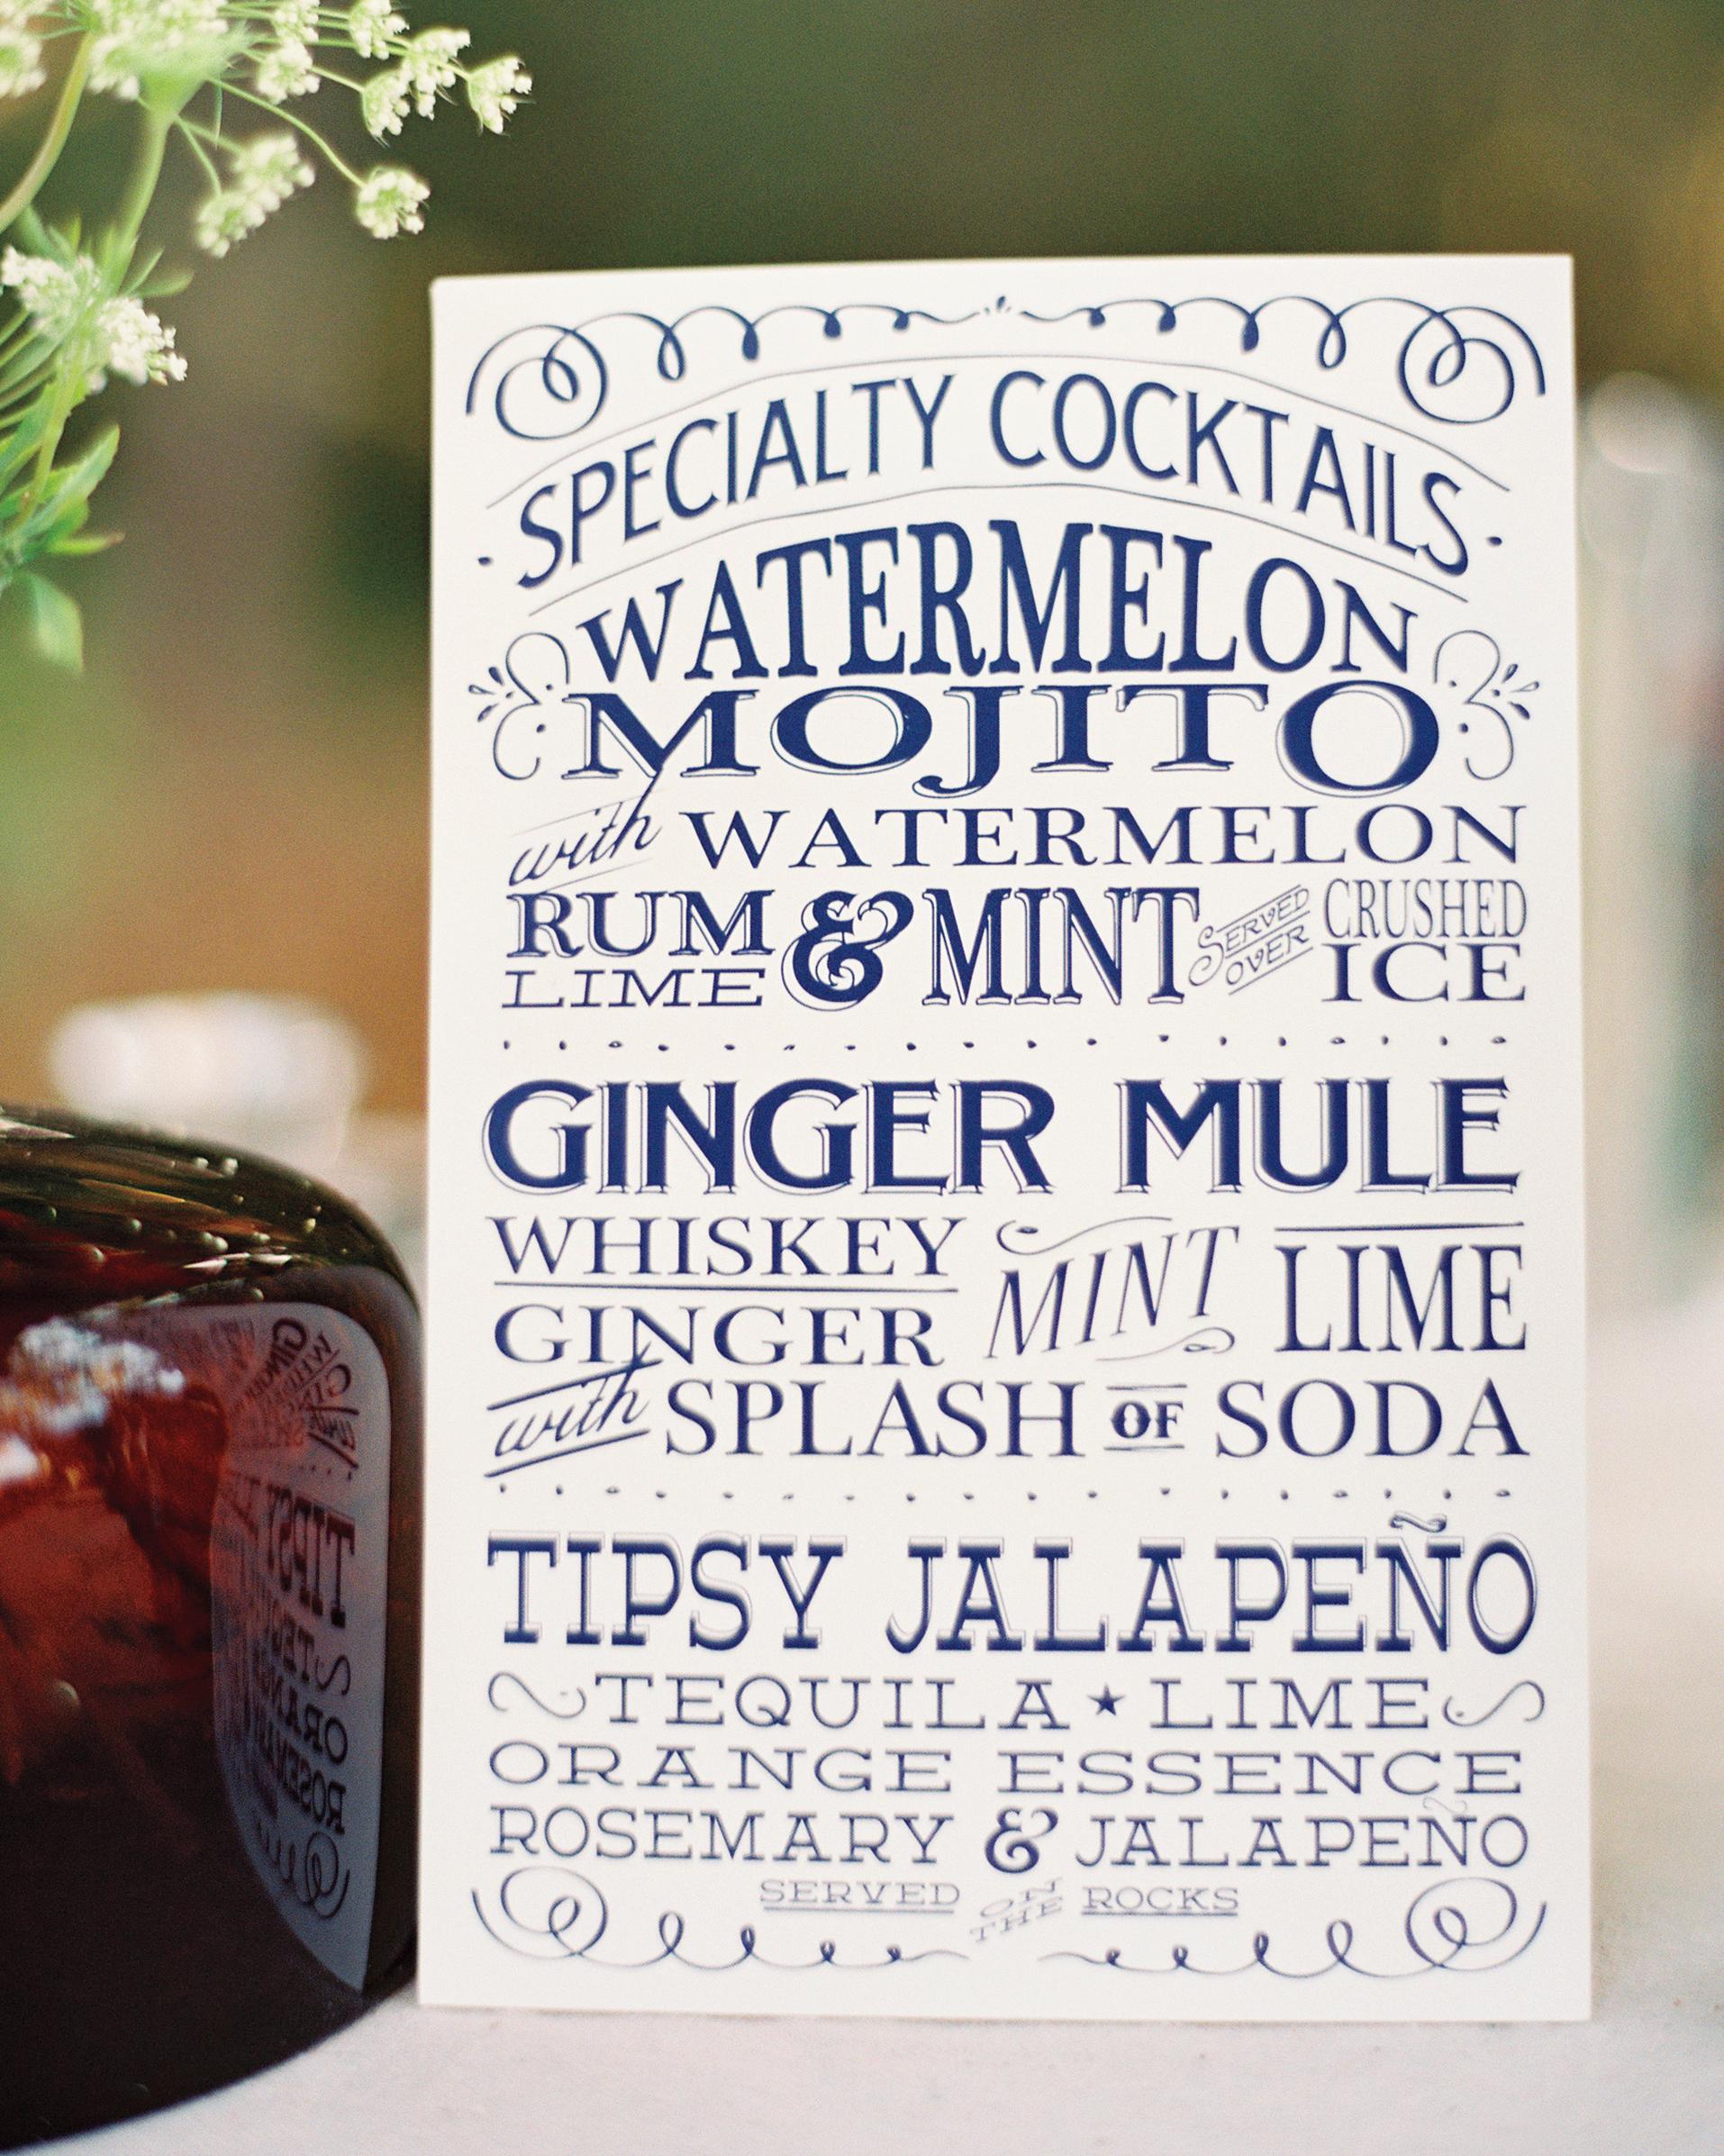 emily-david-drinks-002717-r1-013-mwds110206.jpg